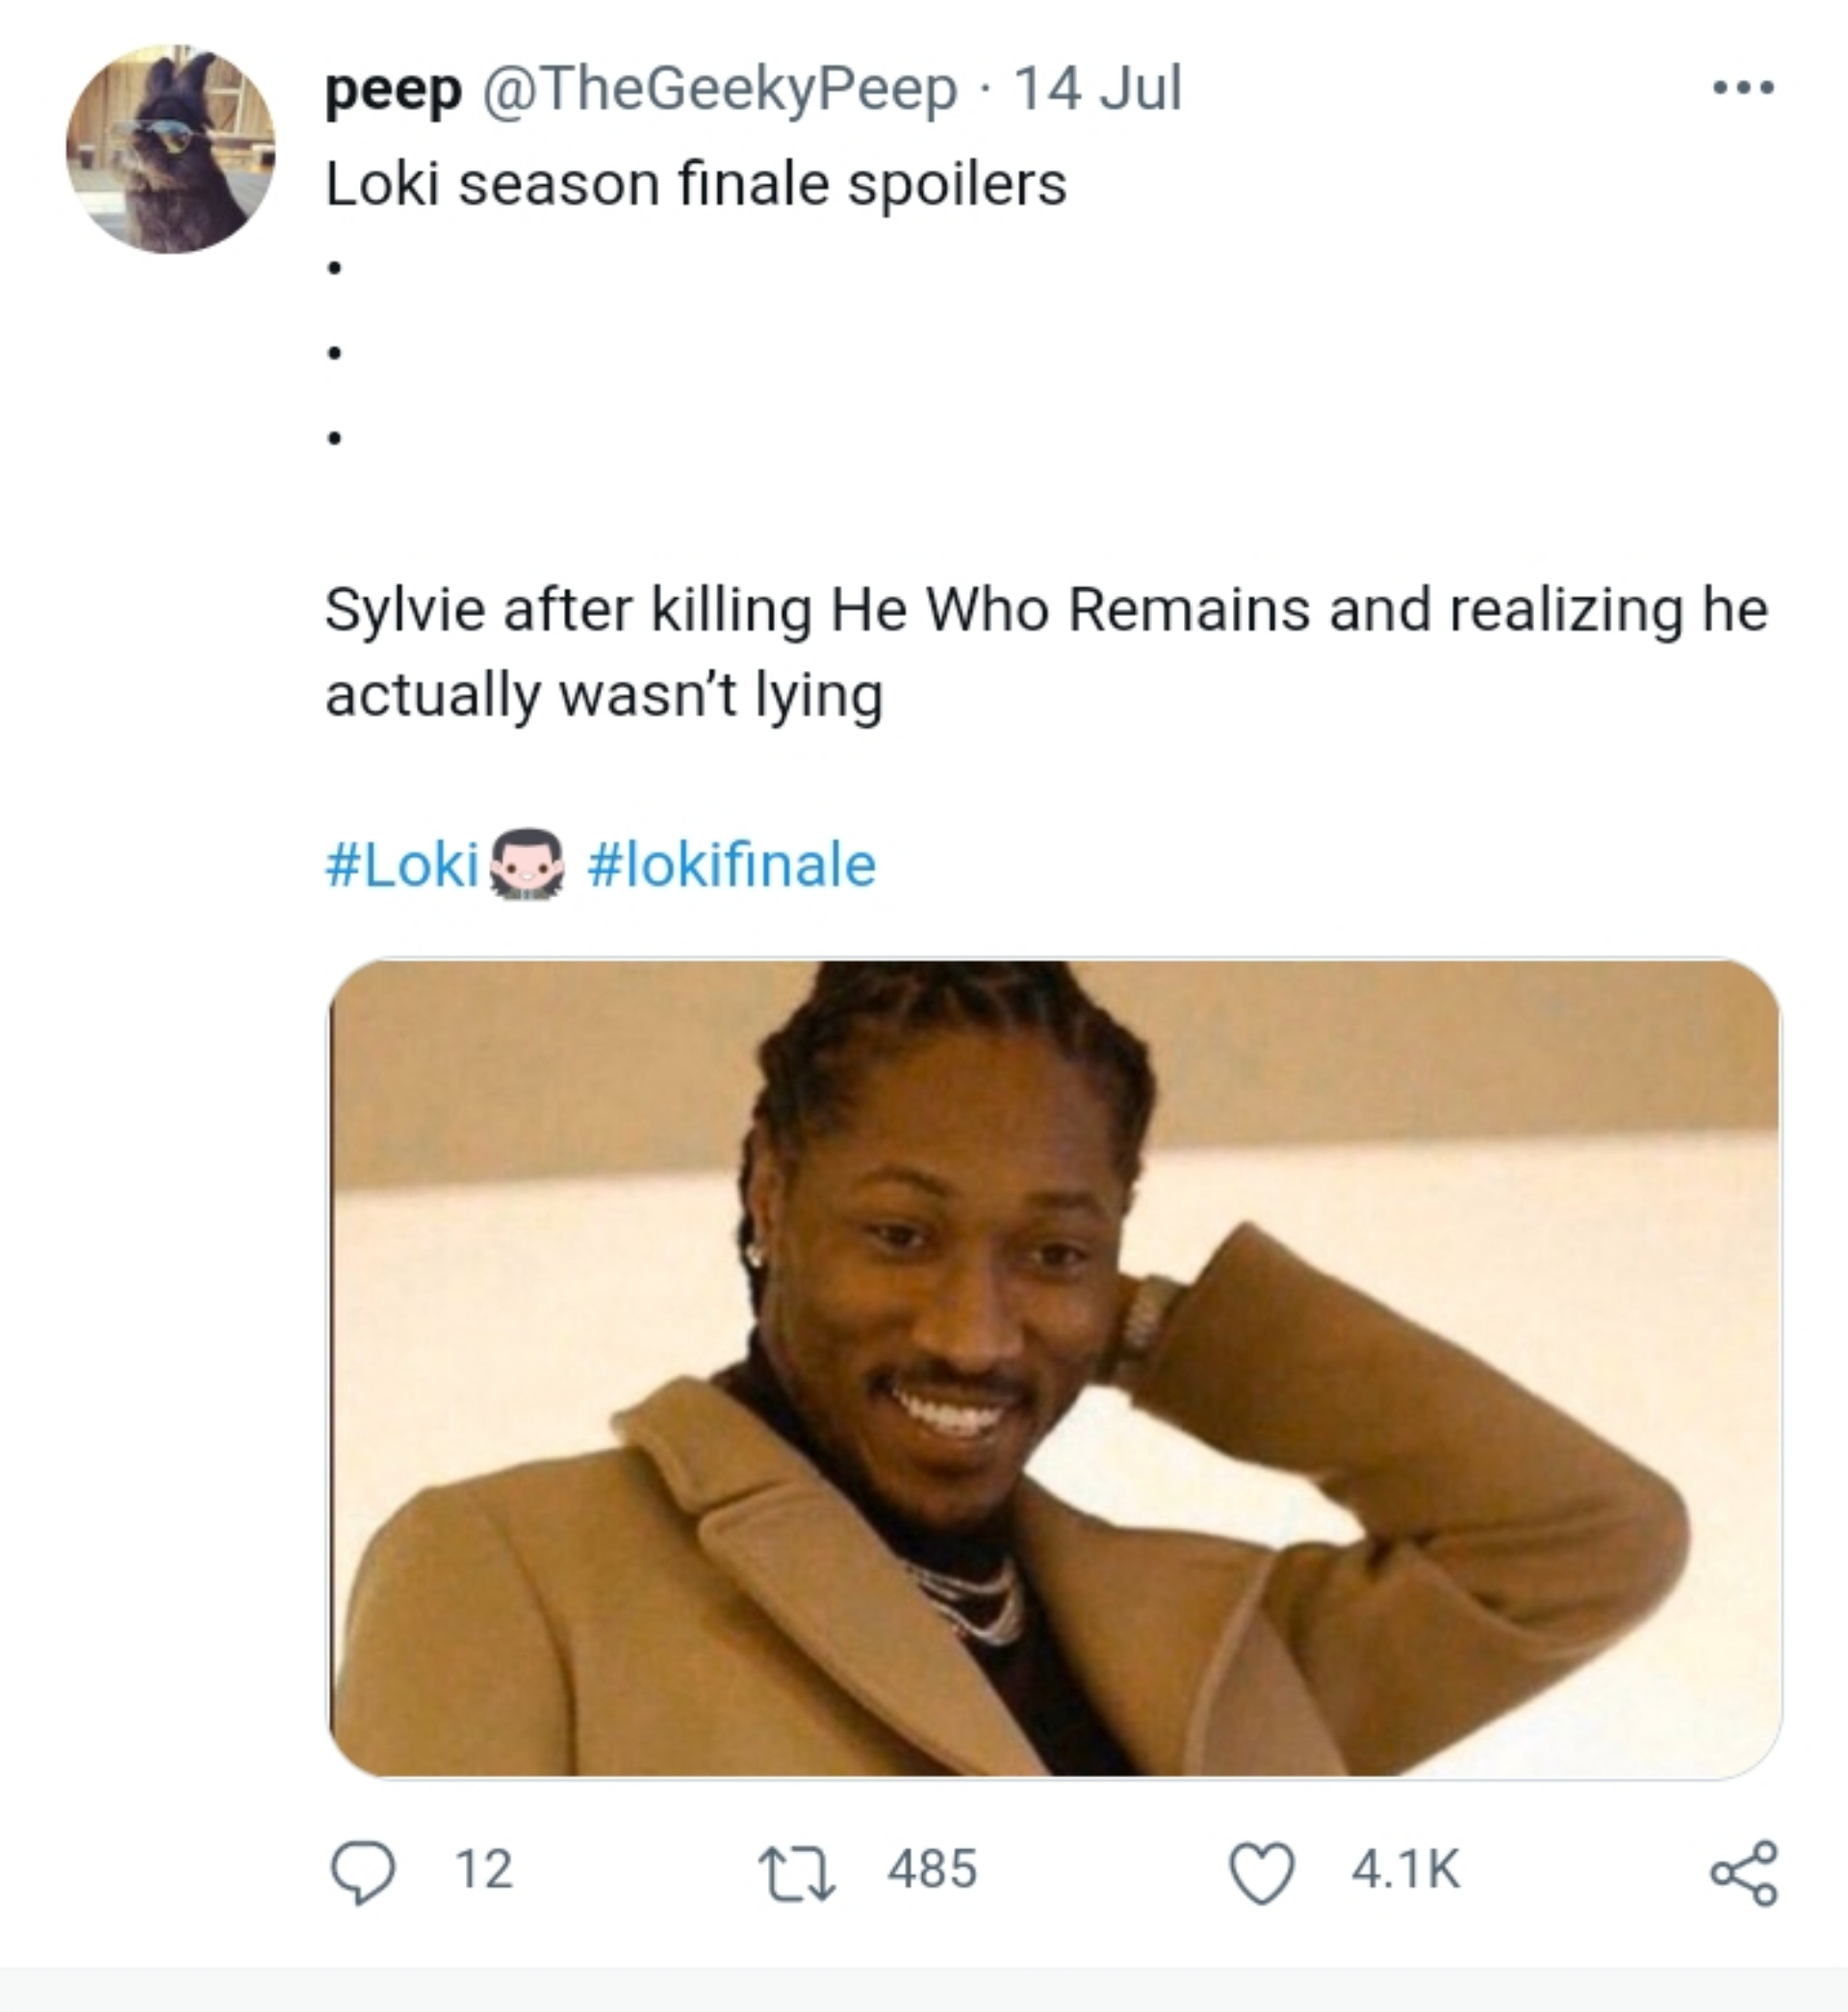 Loki season finale tweets